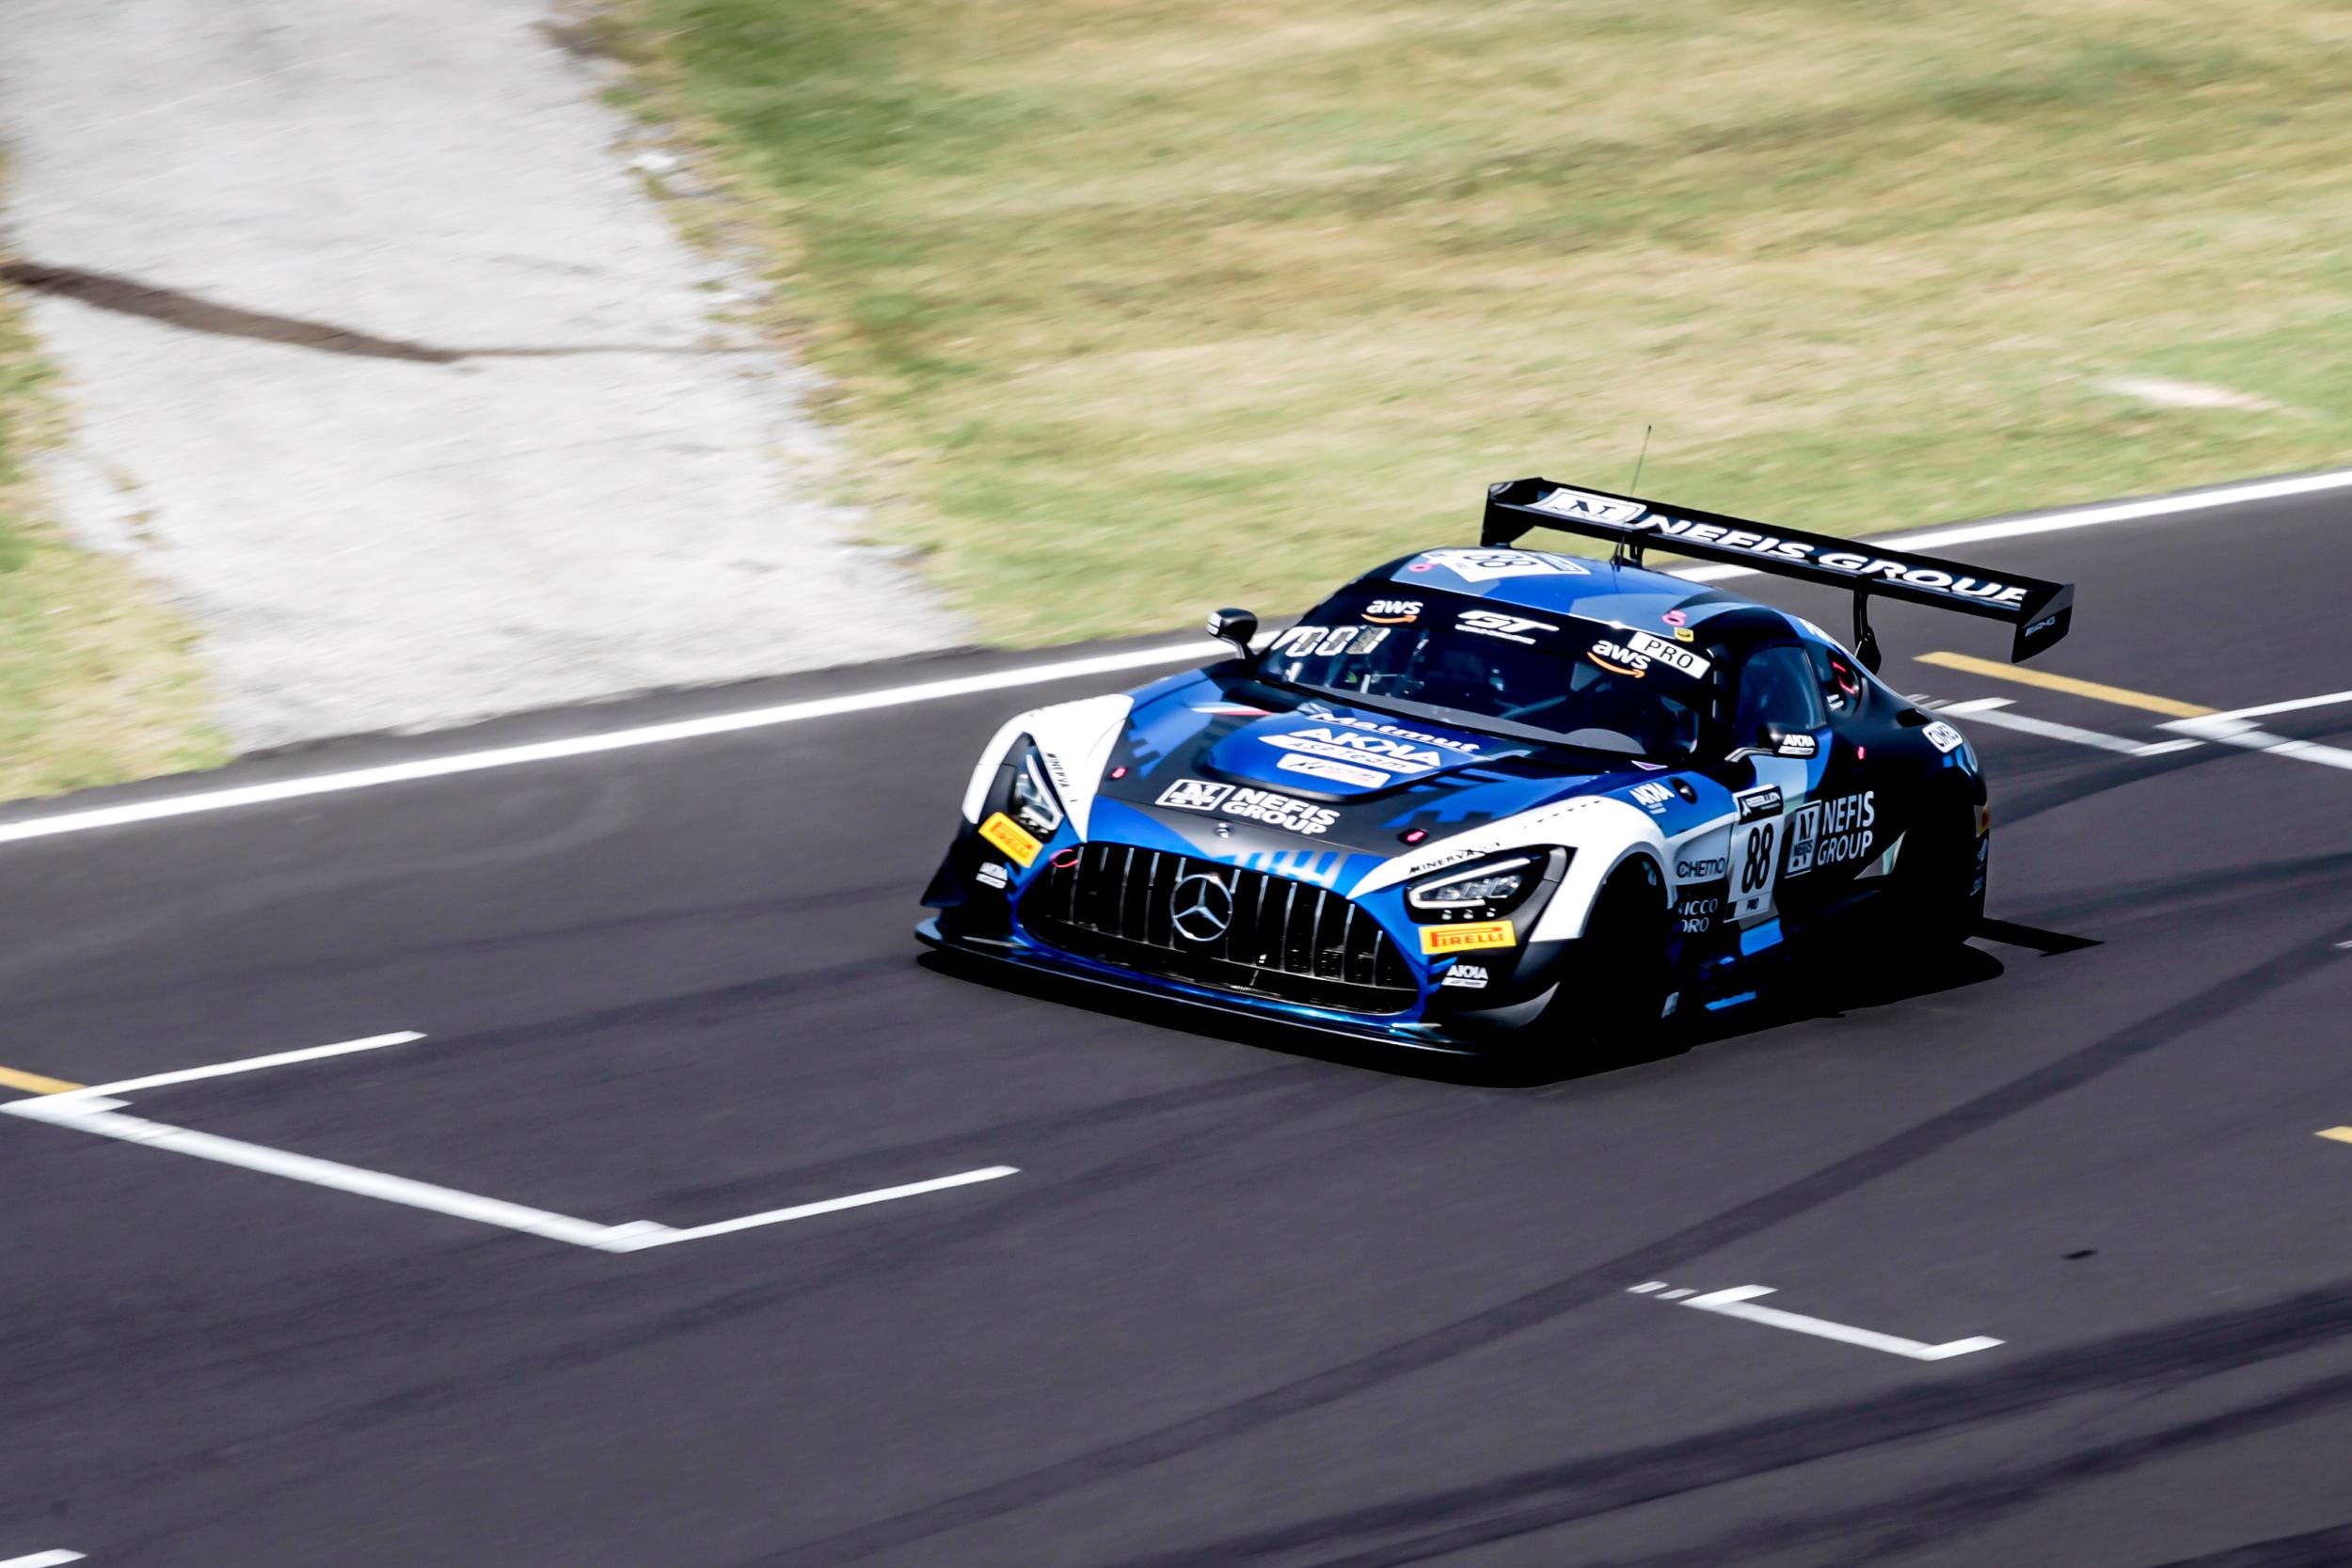 Timur Boguslavskiy Raffaele Marciello AKKA ASP Mercedes-AMG GT3 GT World Challenge Europe Sprint Cup Misano